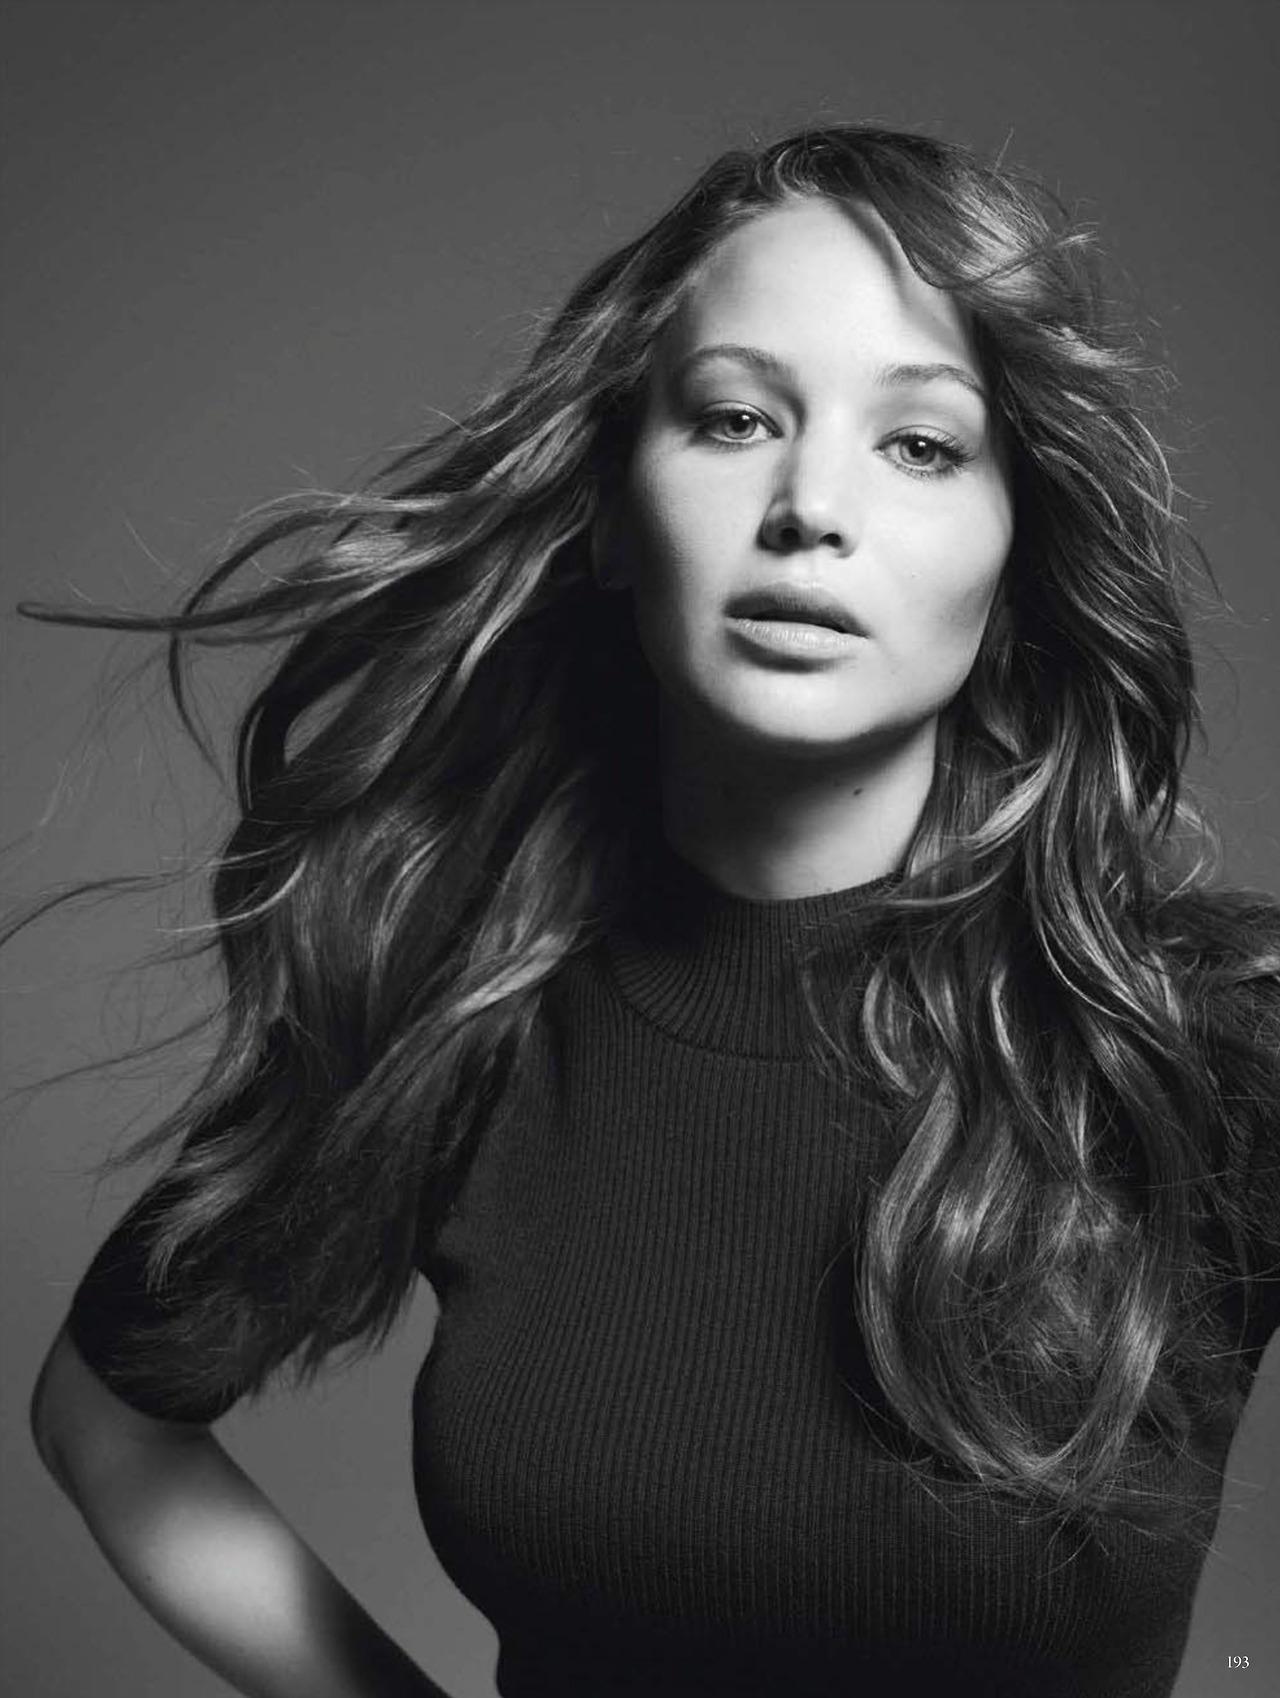 Outtakes Jennifer Lawrence' Time 100